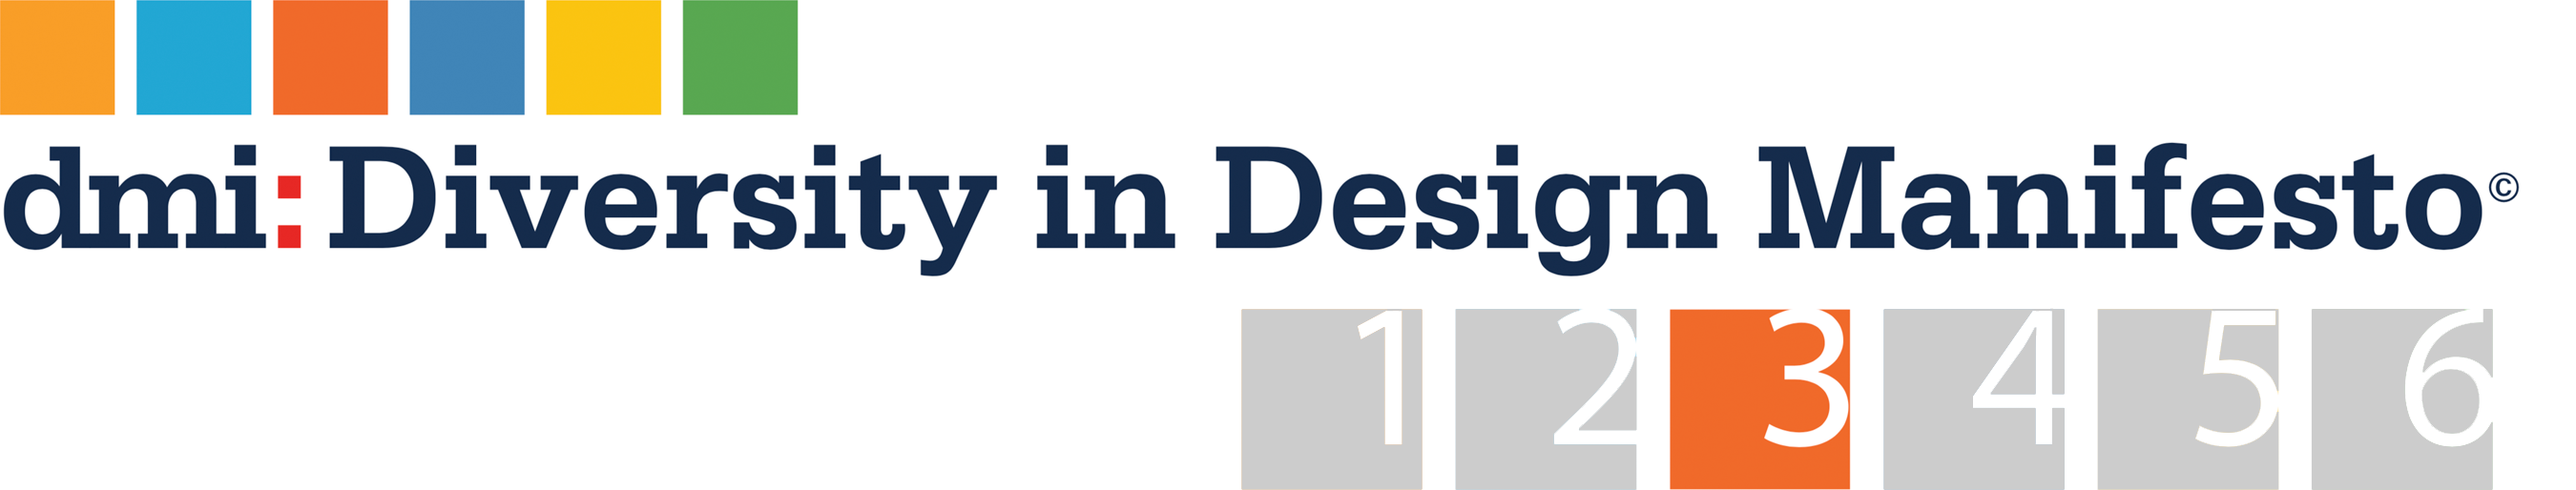 dmi:Diversity in Design Manifesto